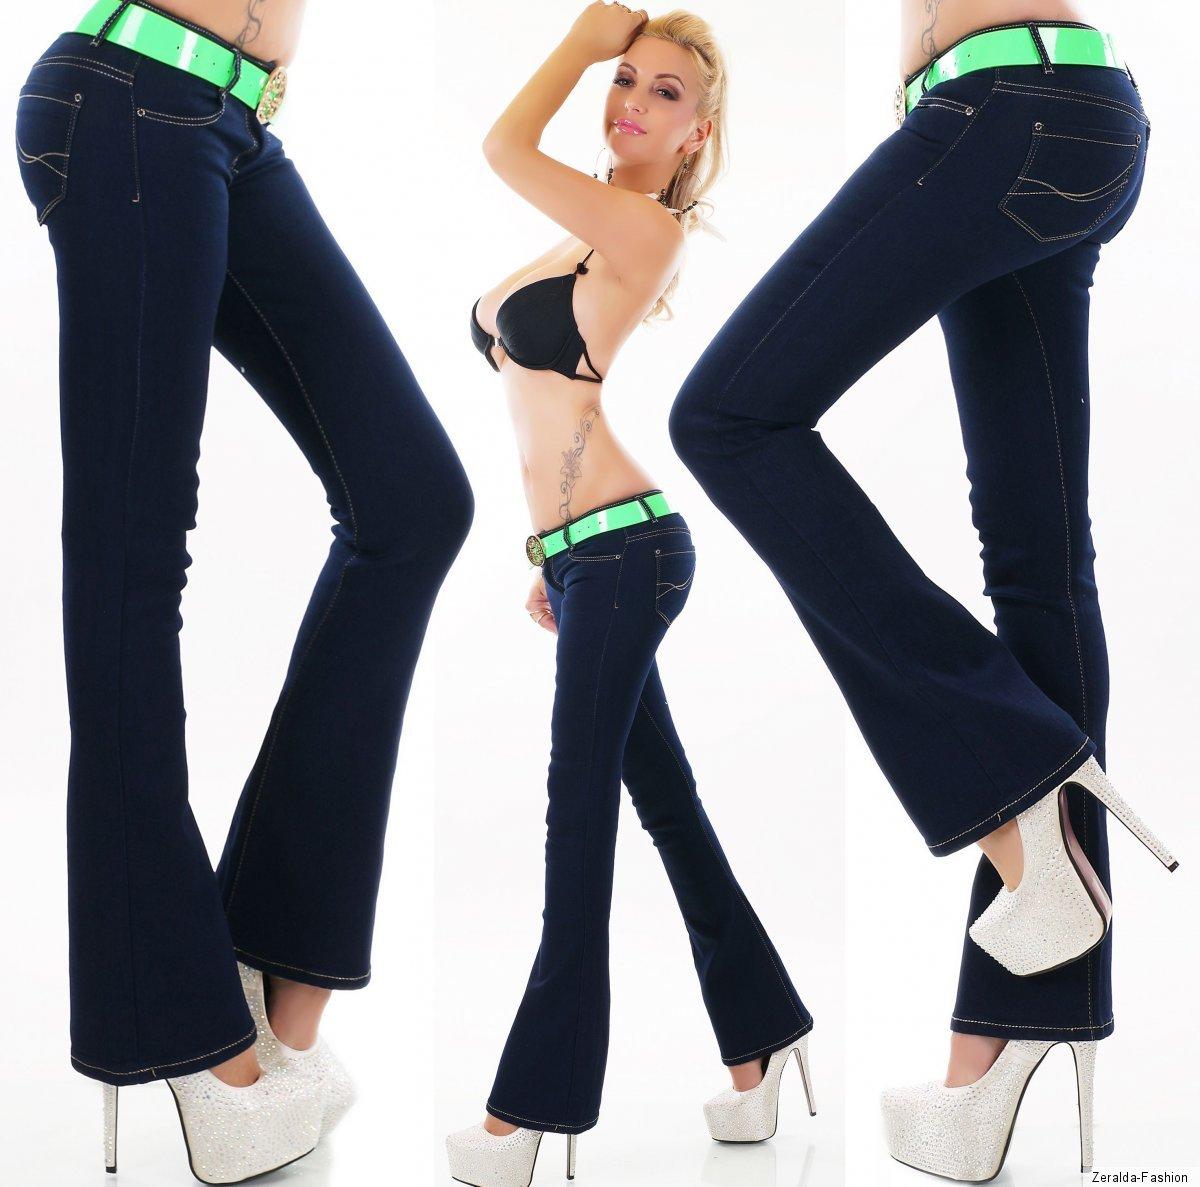 Damen Hüft Jeans Hose Schlag BootCut Denim incl Gürtel Stone Washed XS-XL